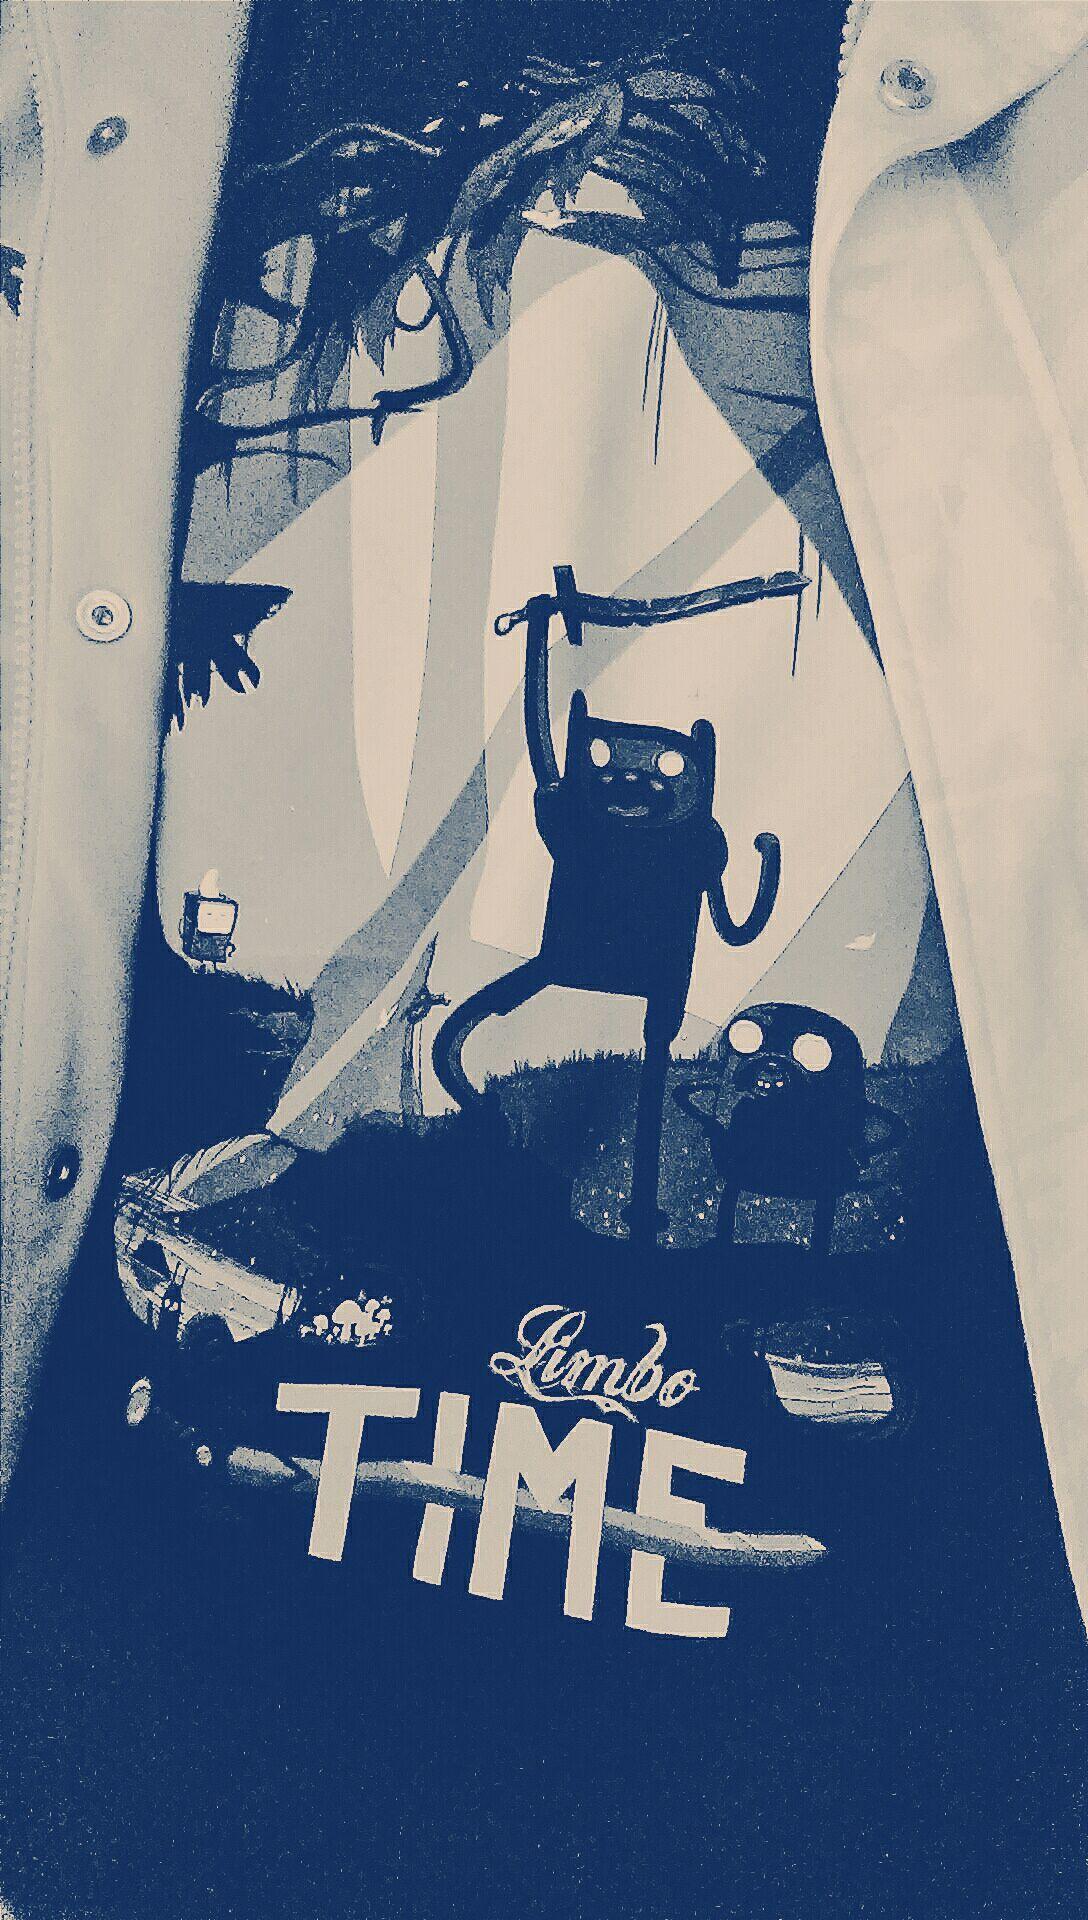 Limbo Time My Today S T Shirt Geek Geek Stuff Today